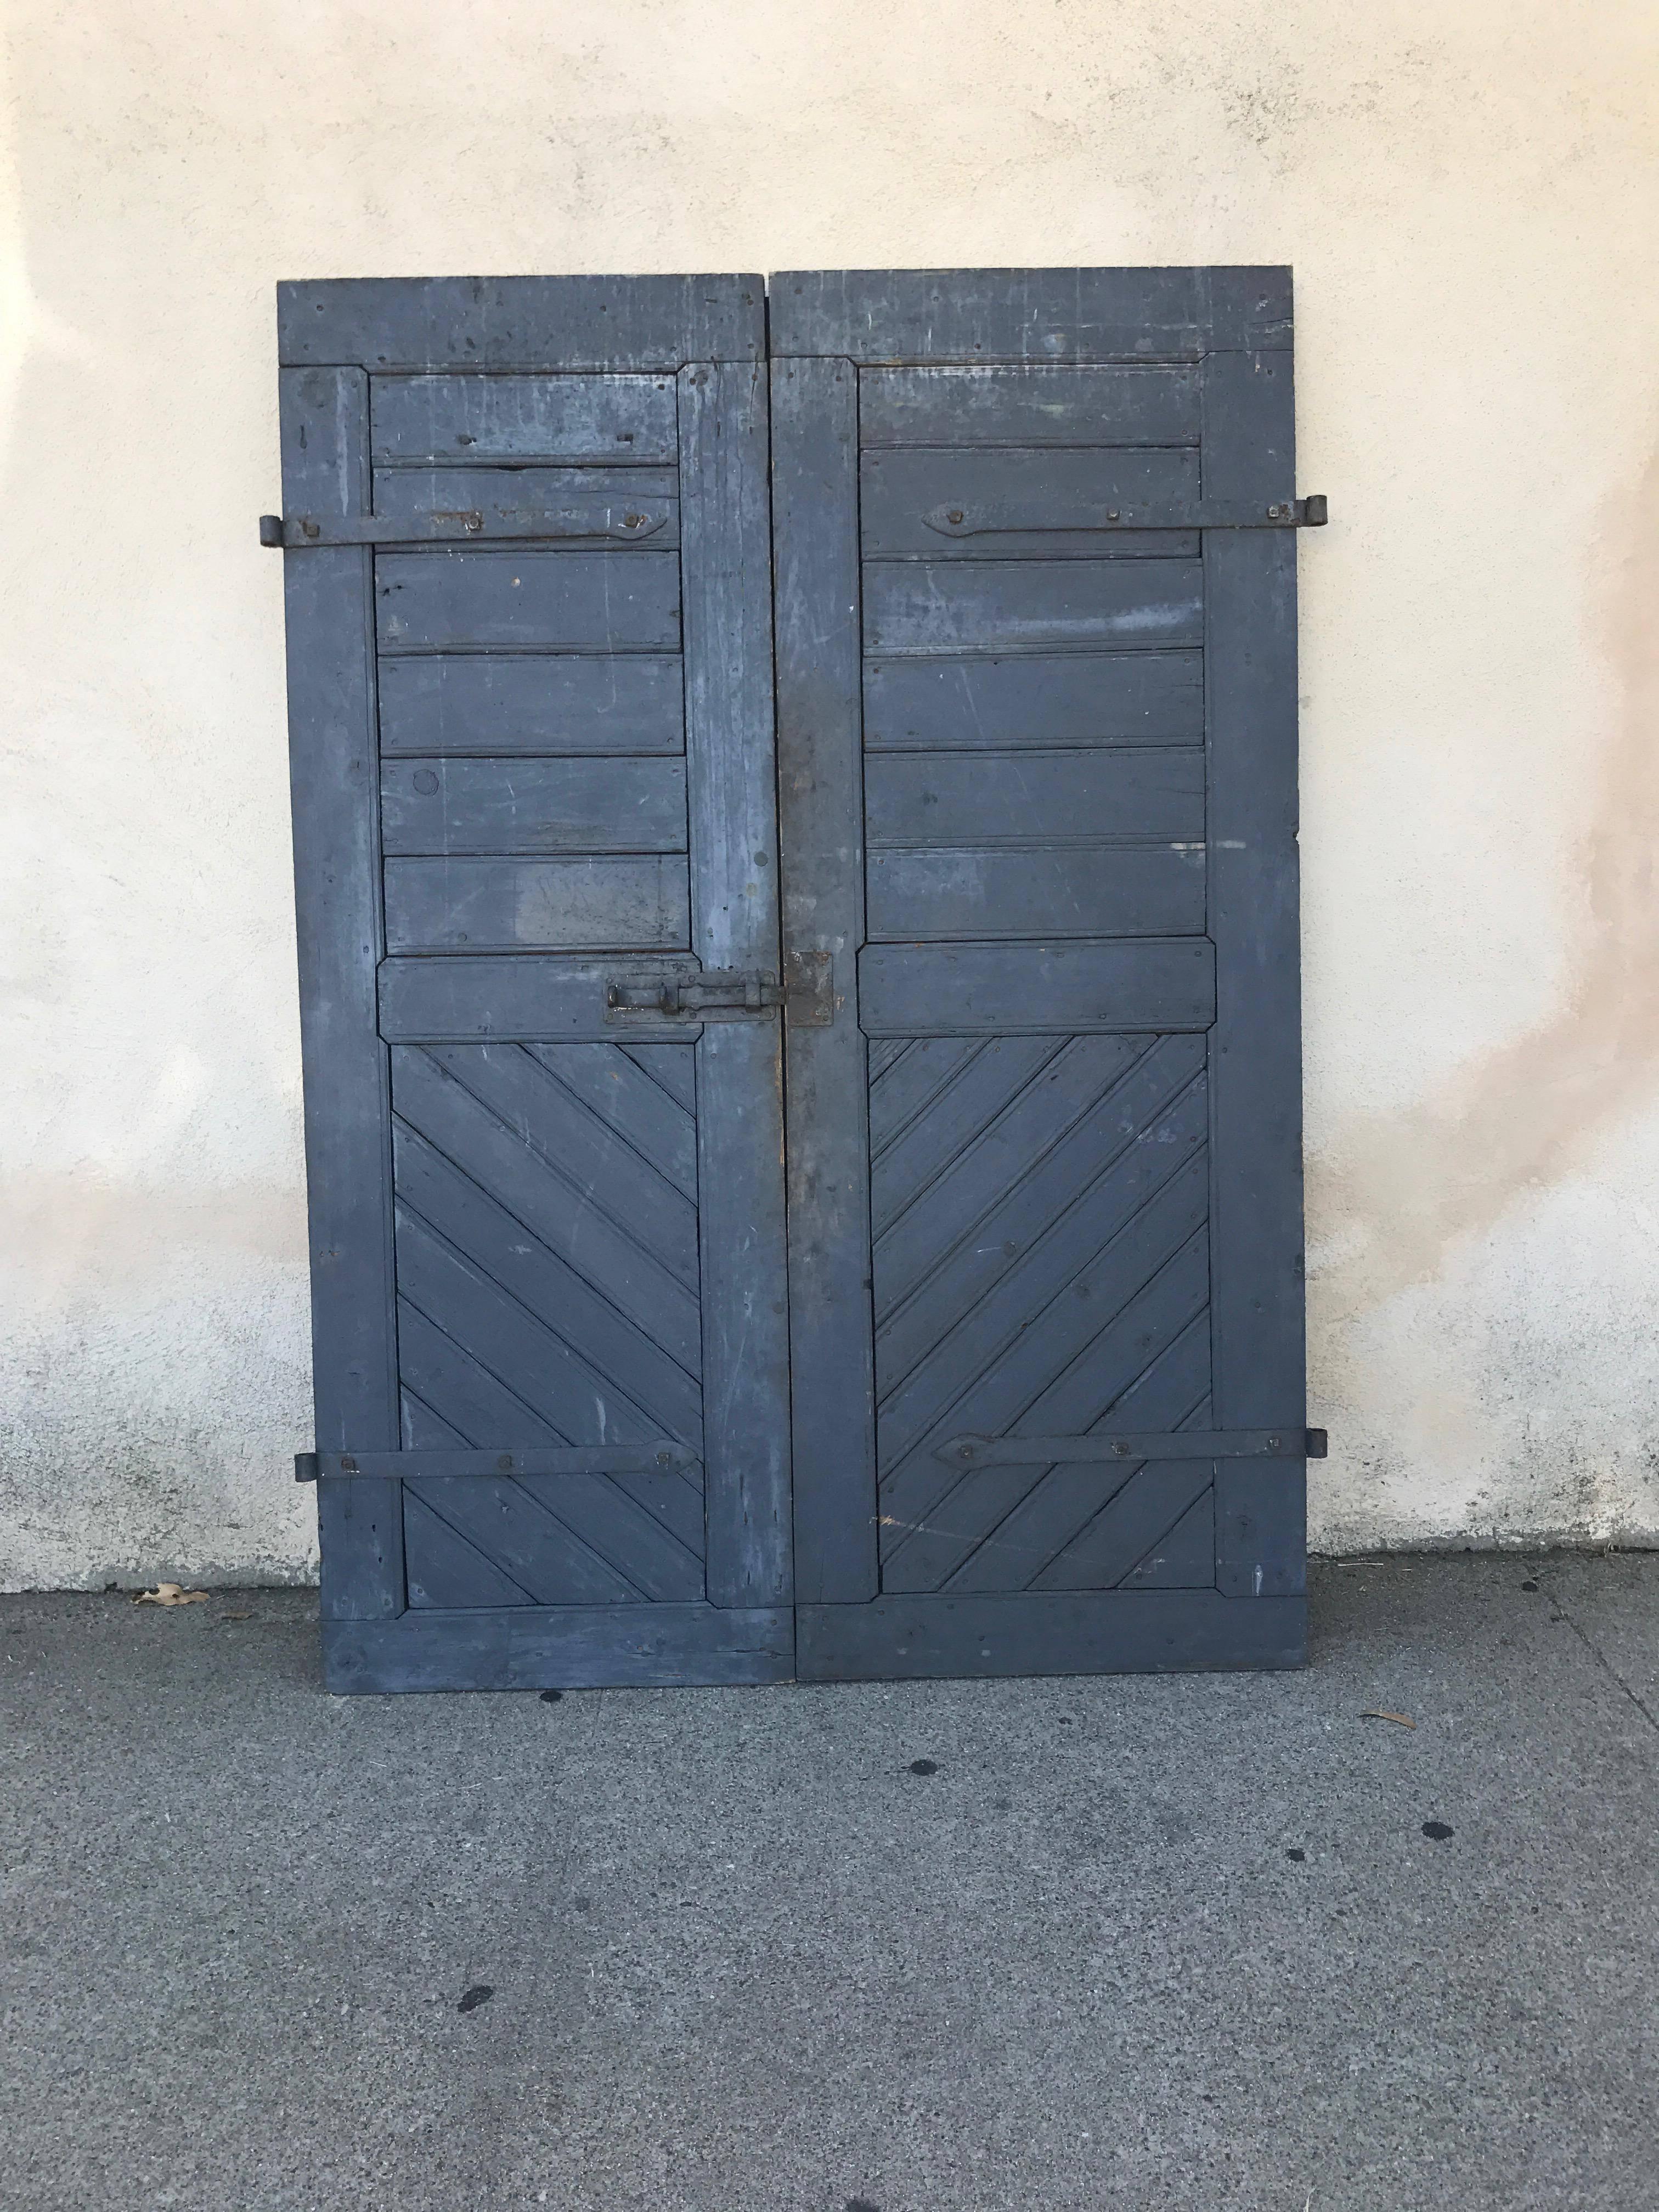 & Pair of Antique European Farm Doors For Sale at 1stdibs